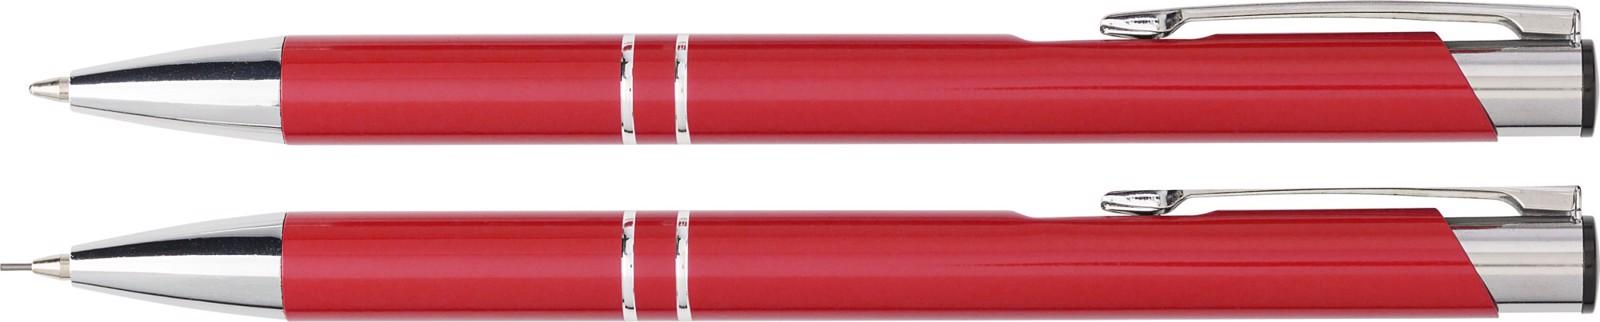 Aluminium writing set - Red